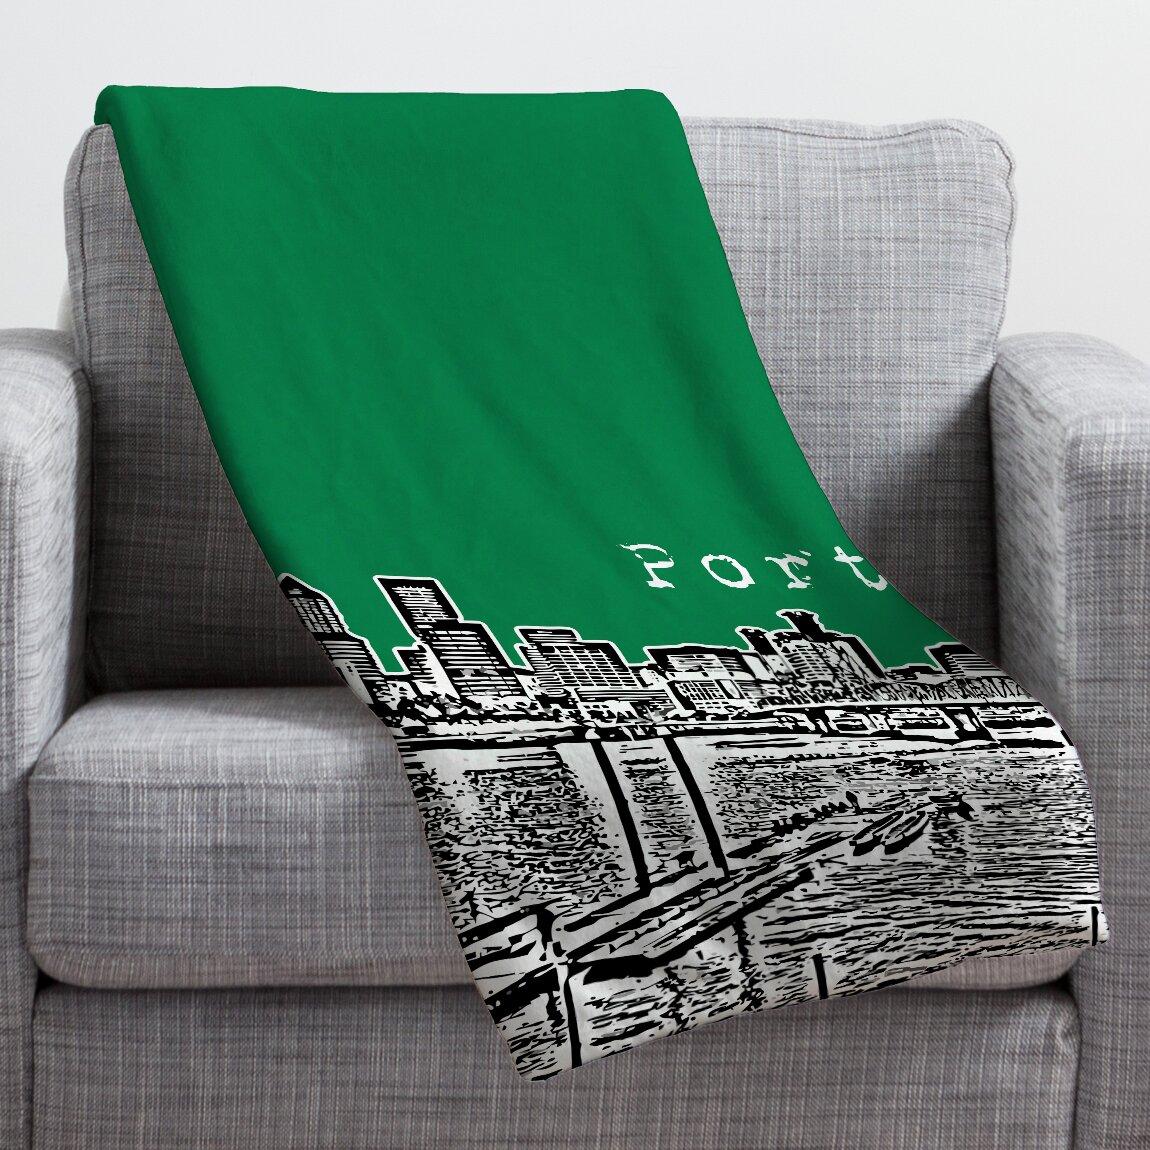 DENY Designs Bird Ave Portland Throw Blanket & Reviews